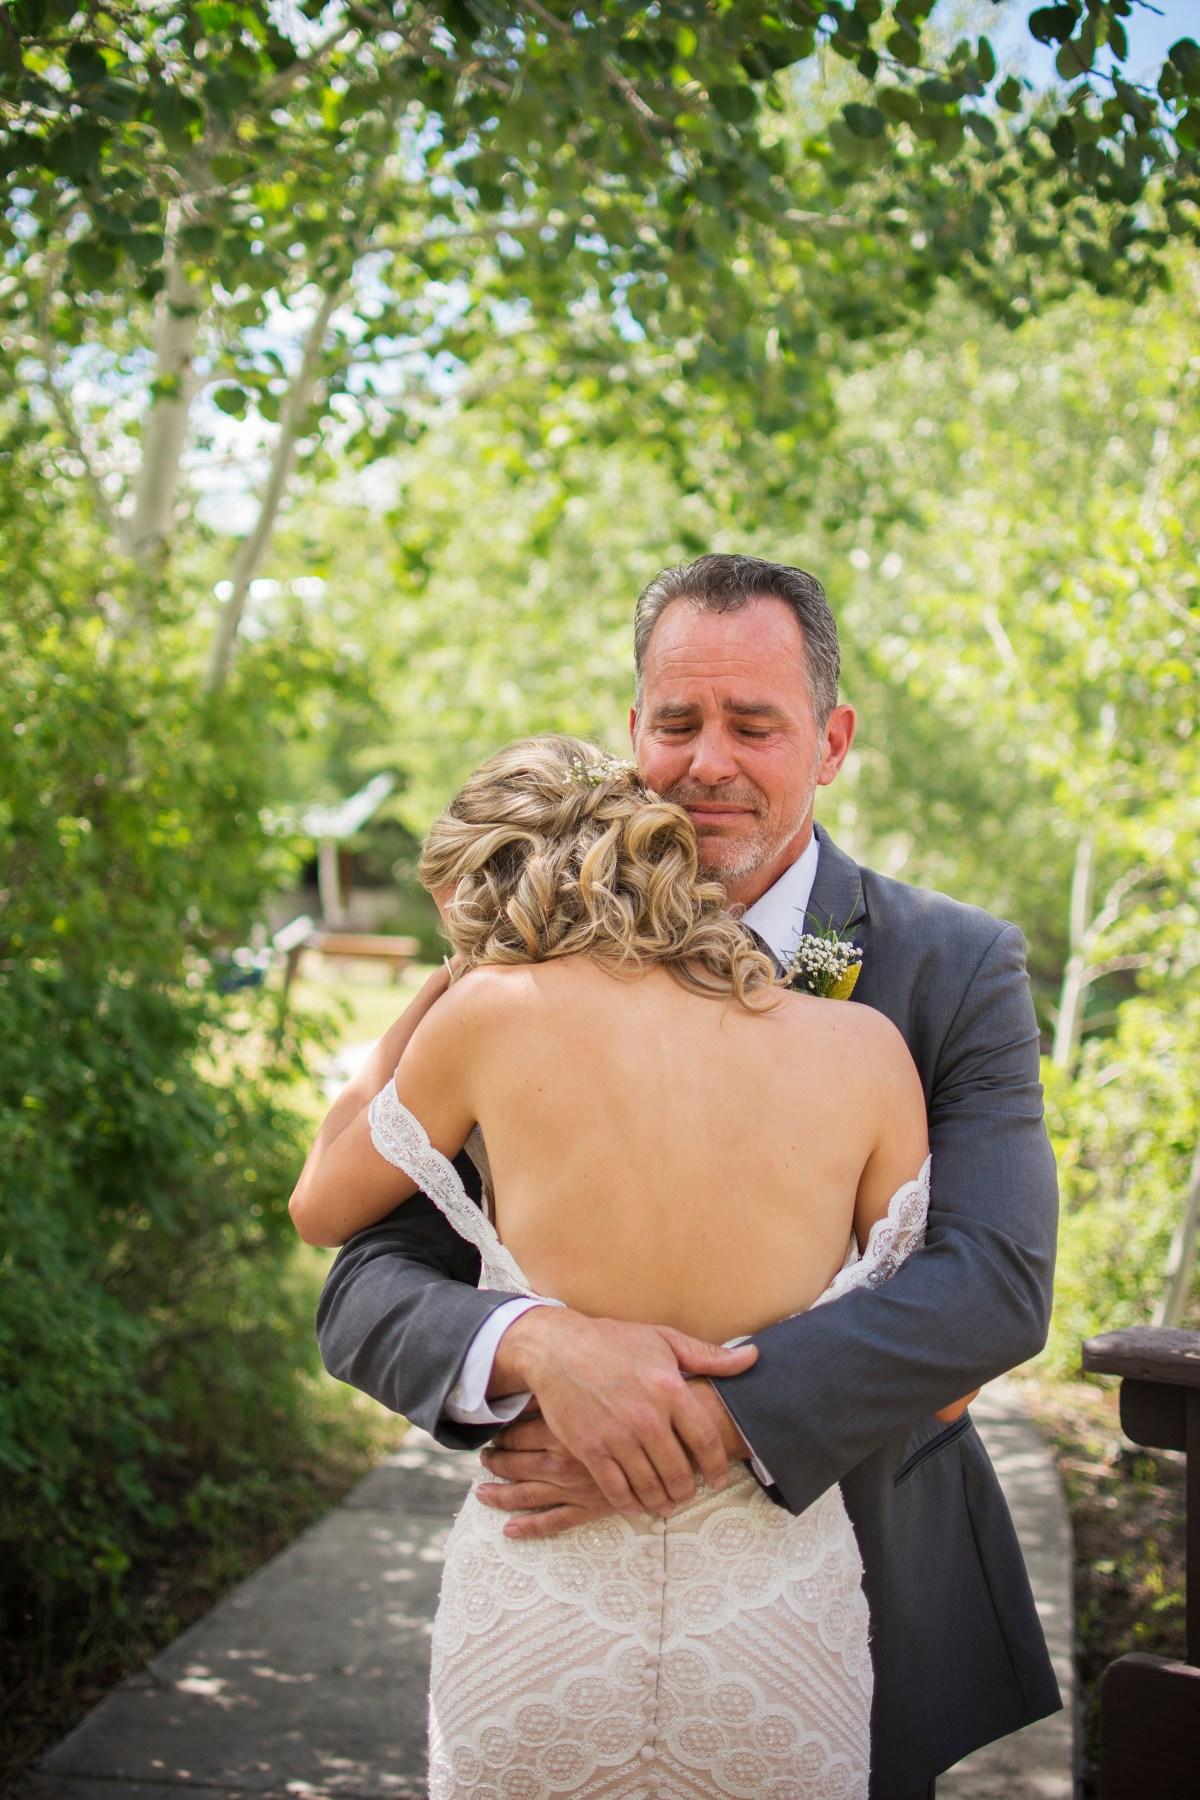 Wedding at Powderhorn Ski Resort on the Grand Mesa, Colorado Wedding Photography